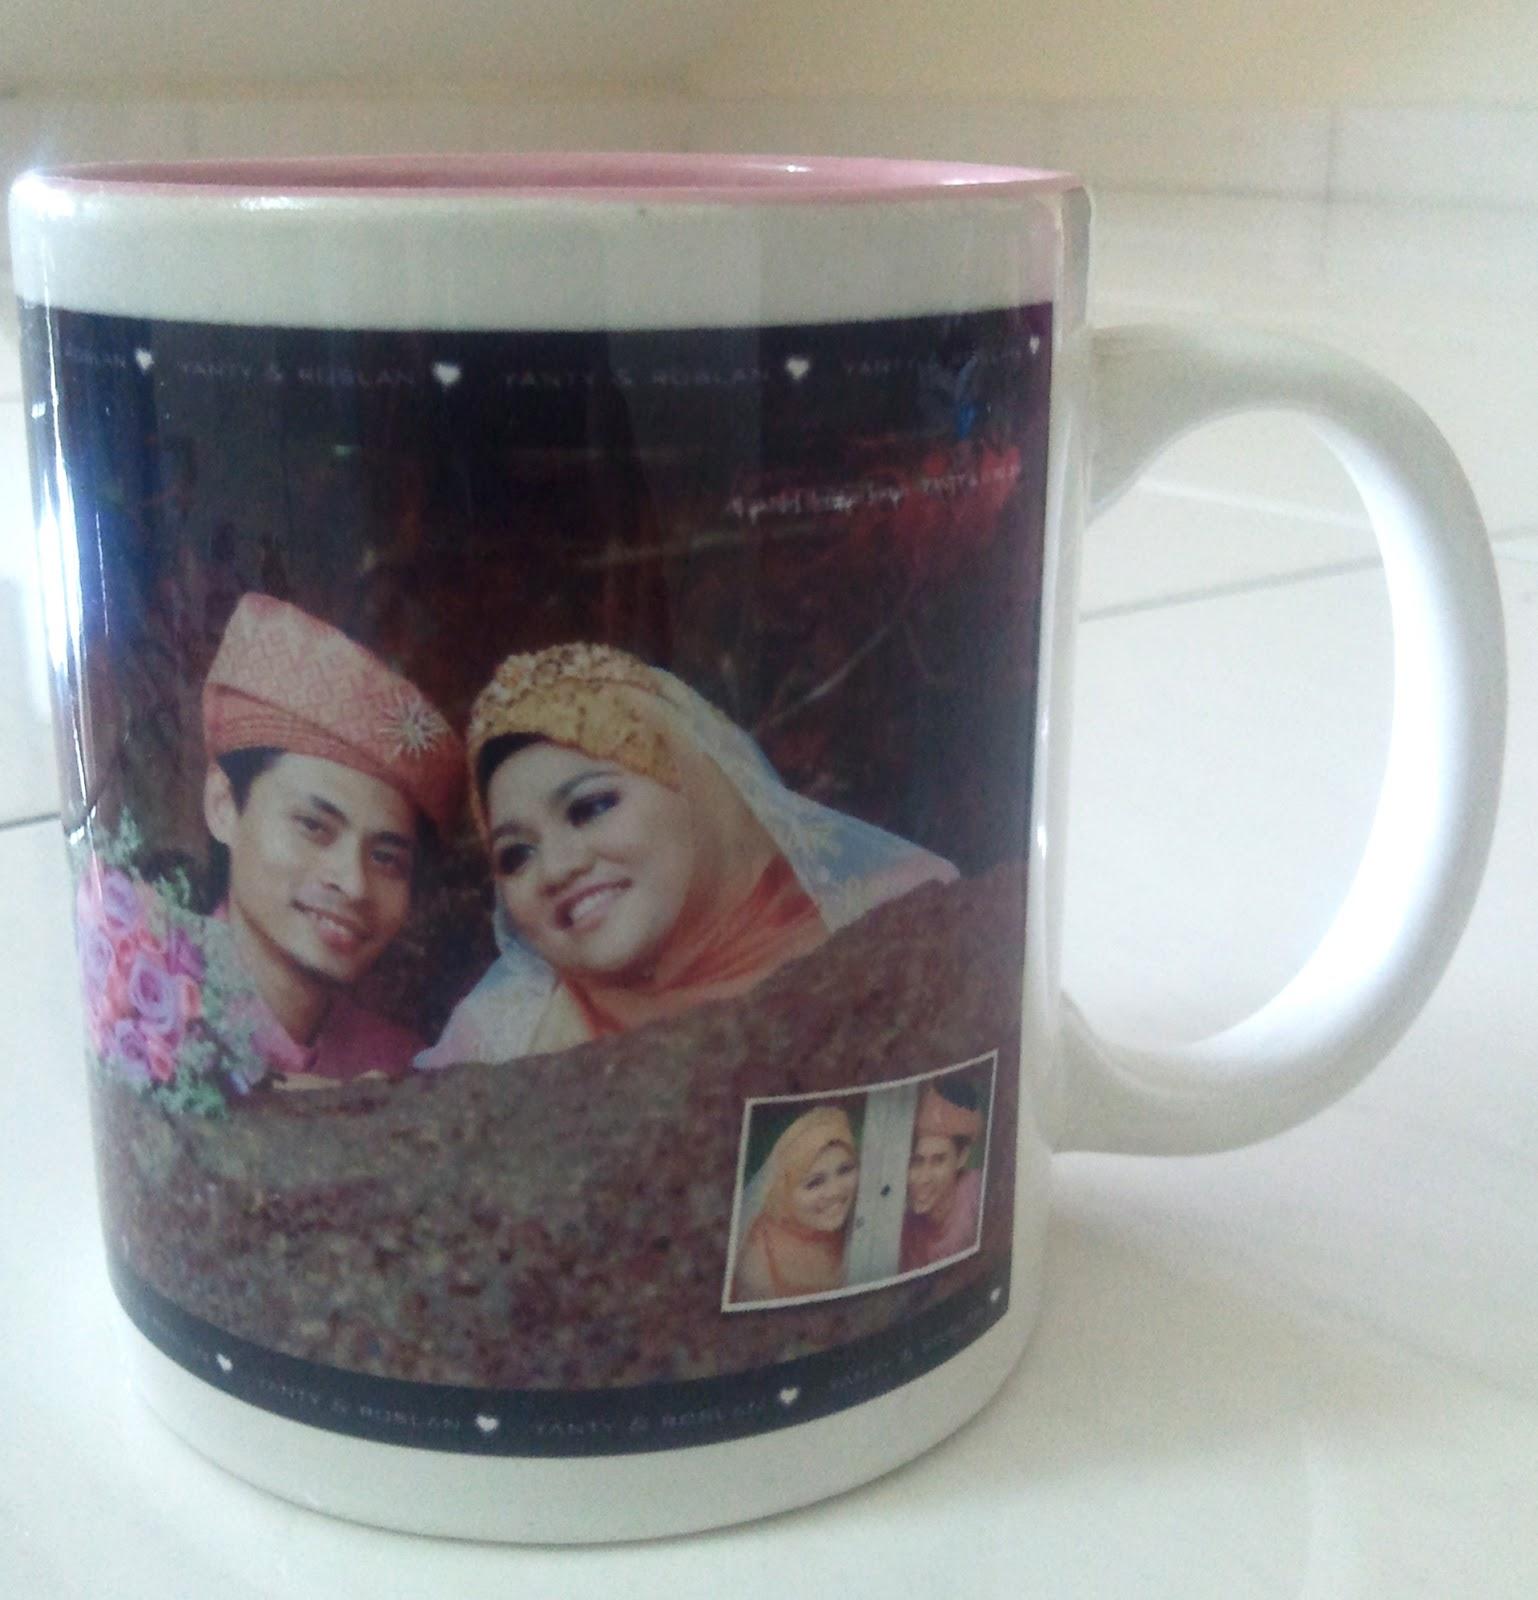 R Amp Zgift Cenderhati Perkahwinan Mug Printed Heat Press